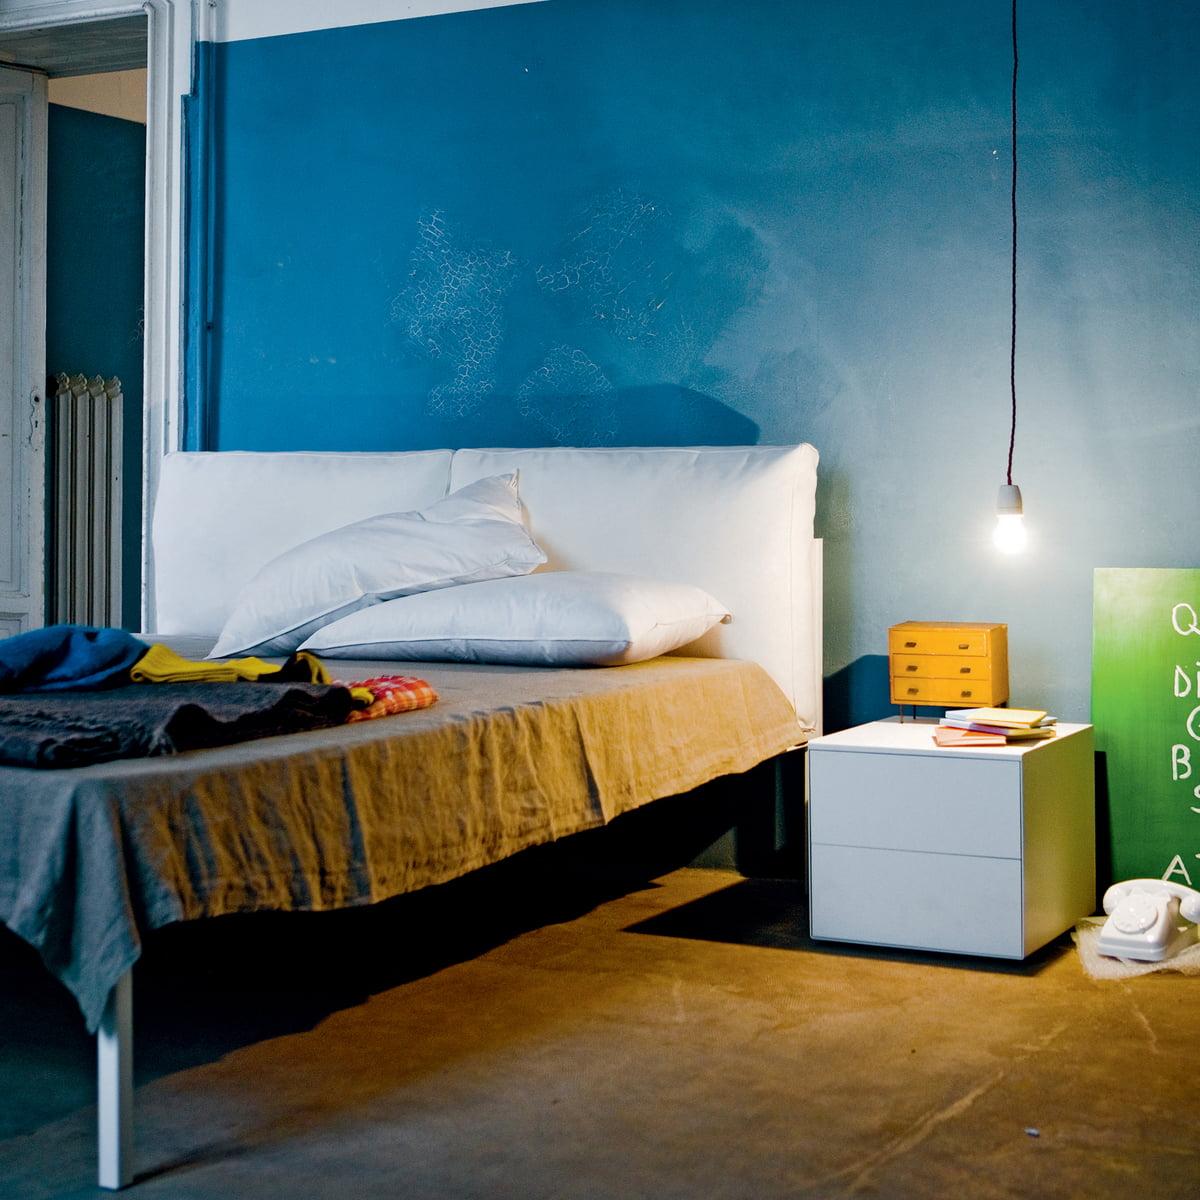 Nyx bett zanotta shop for Bett 50 euro